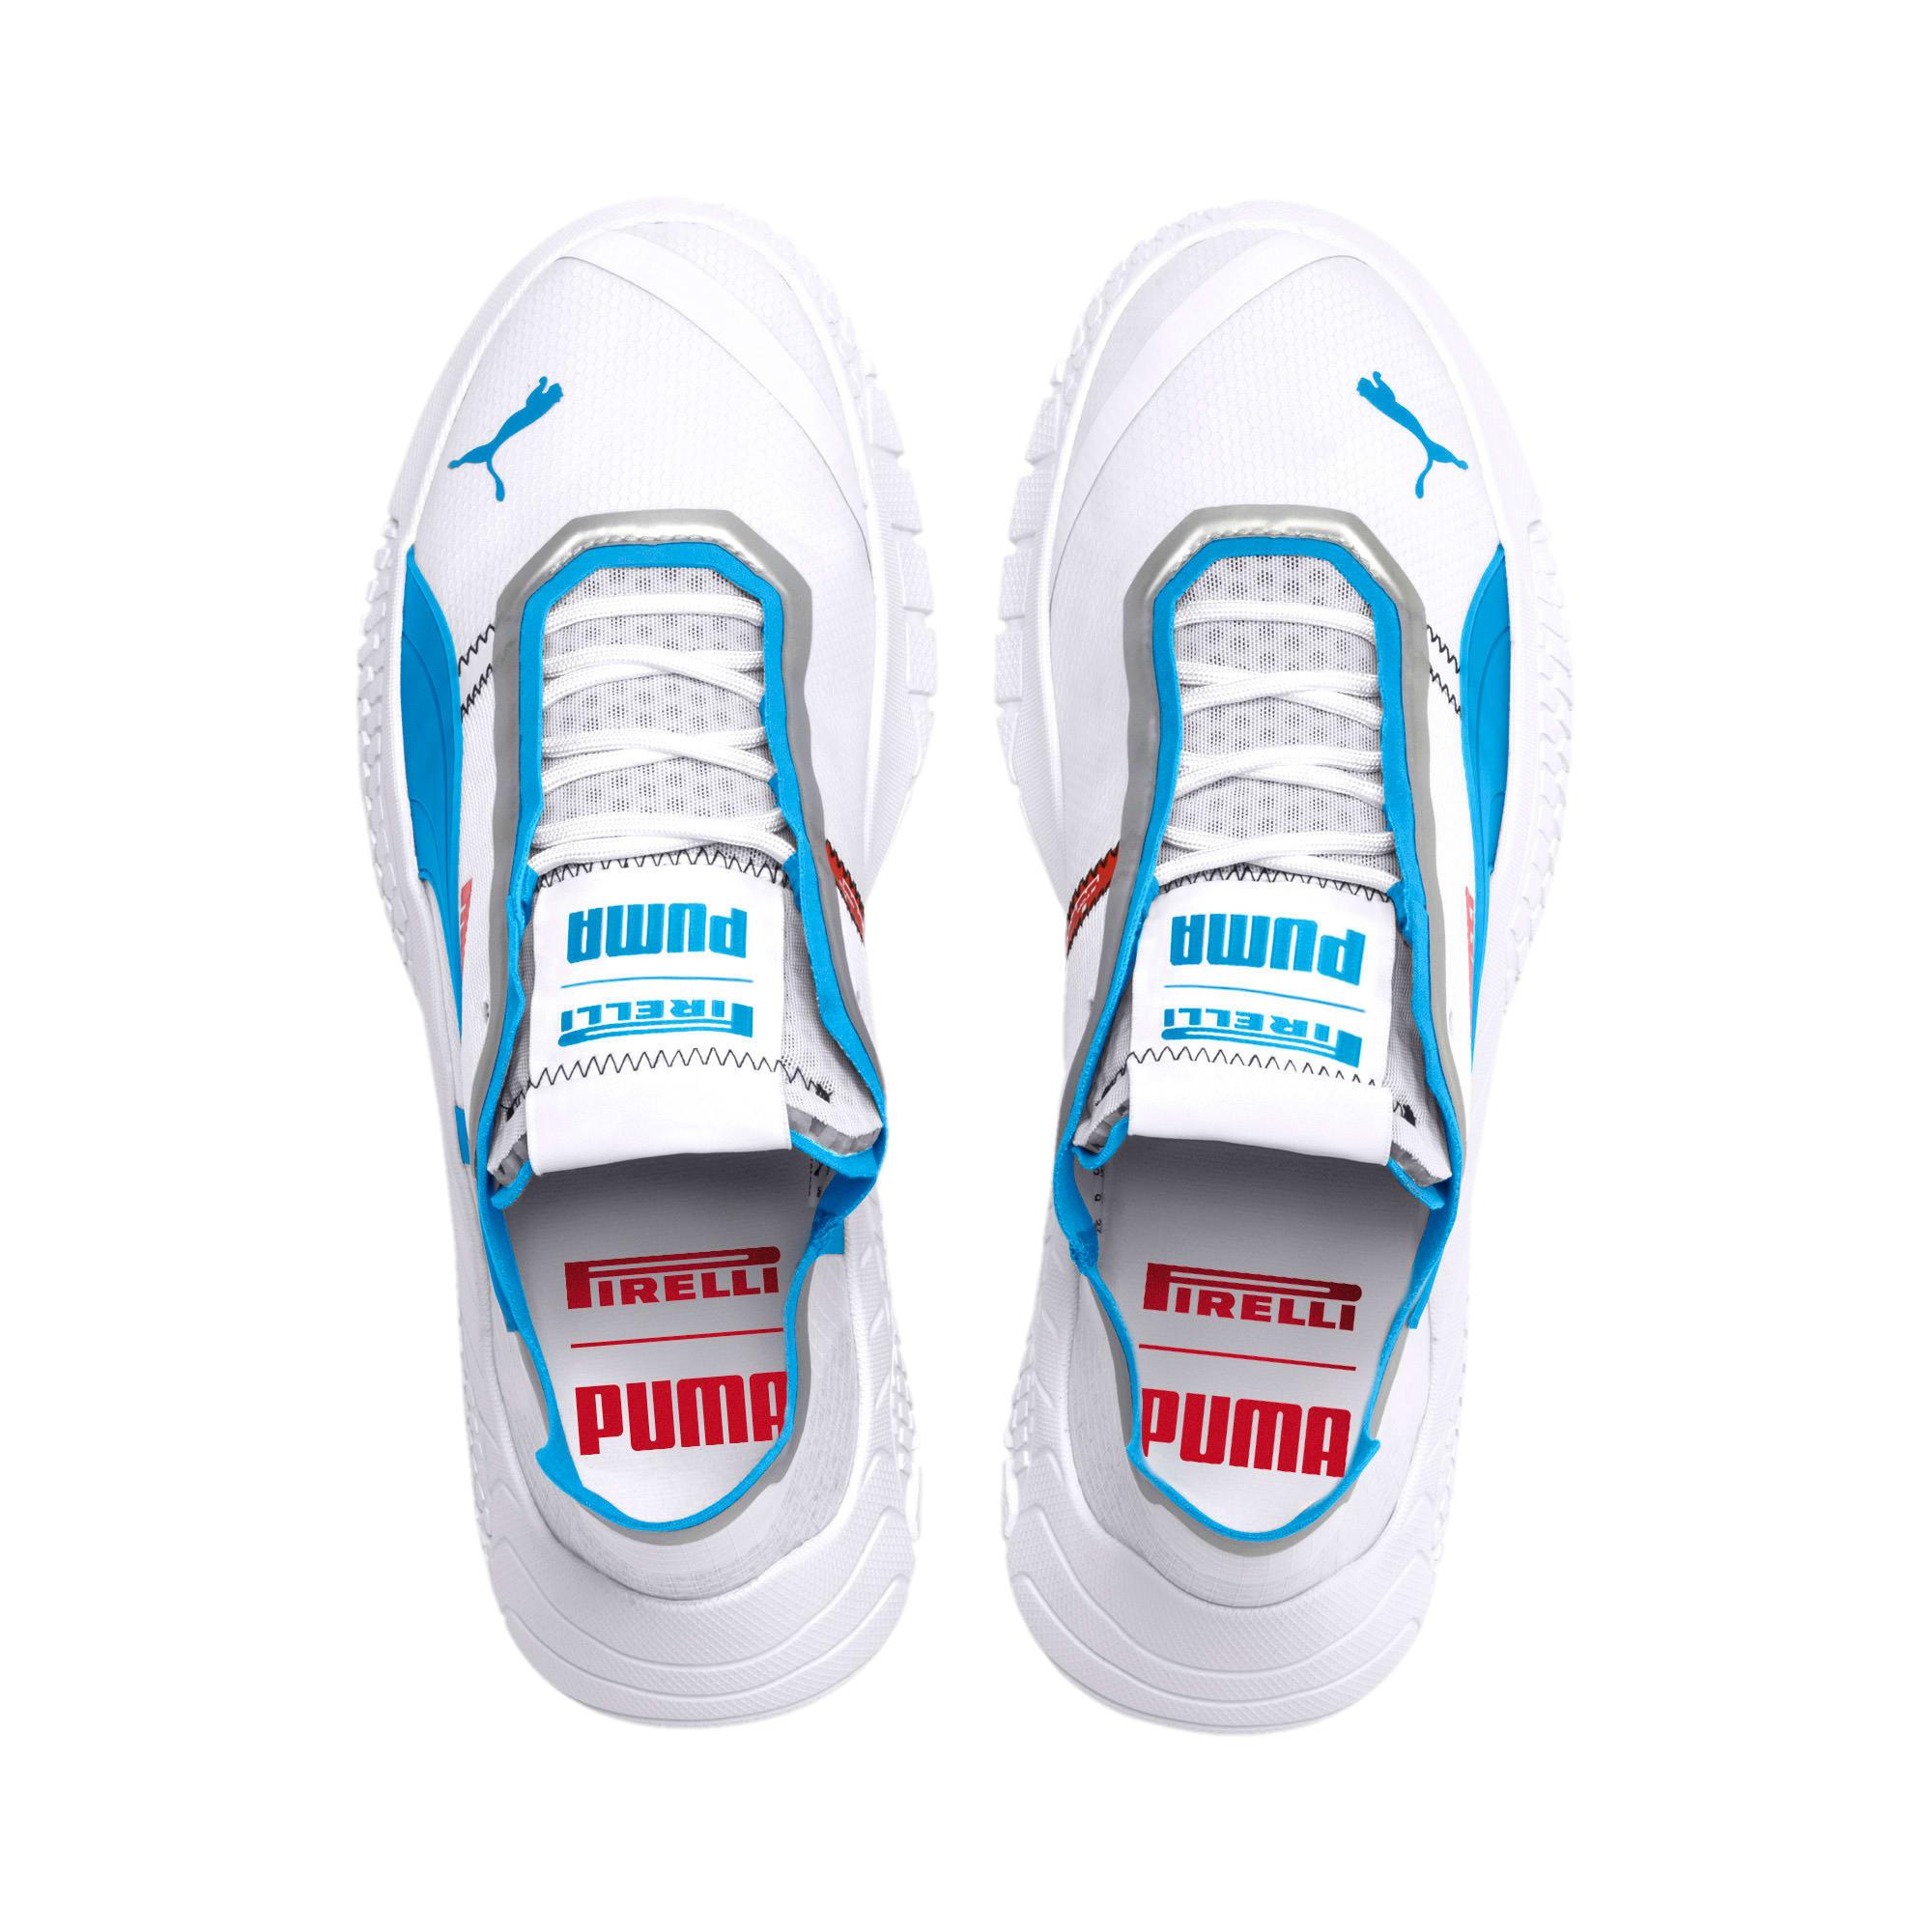 Thumbnail 9 of Pirelli Replicat-X Trainers, Puma White-AZURE BLUE, medium